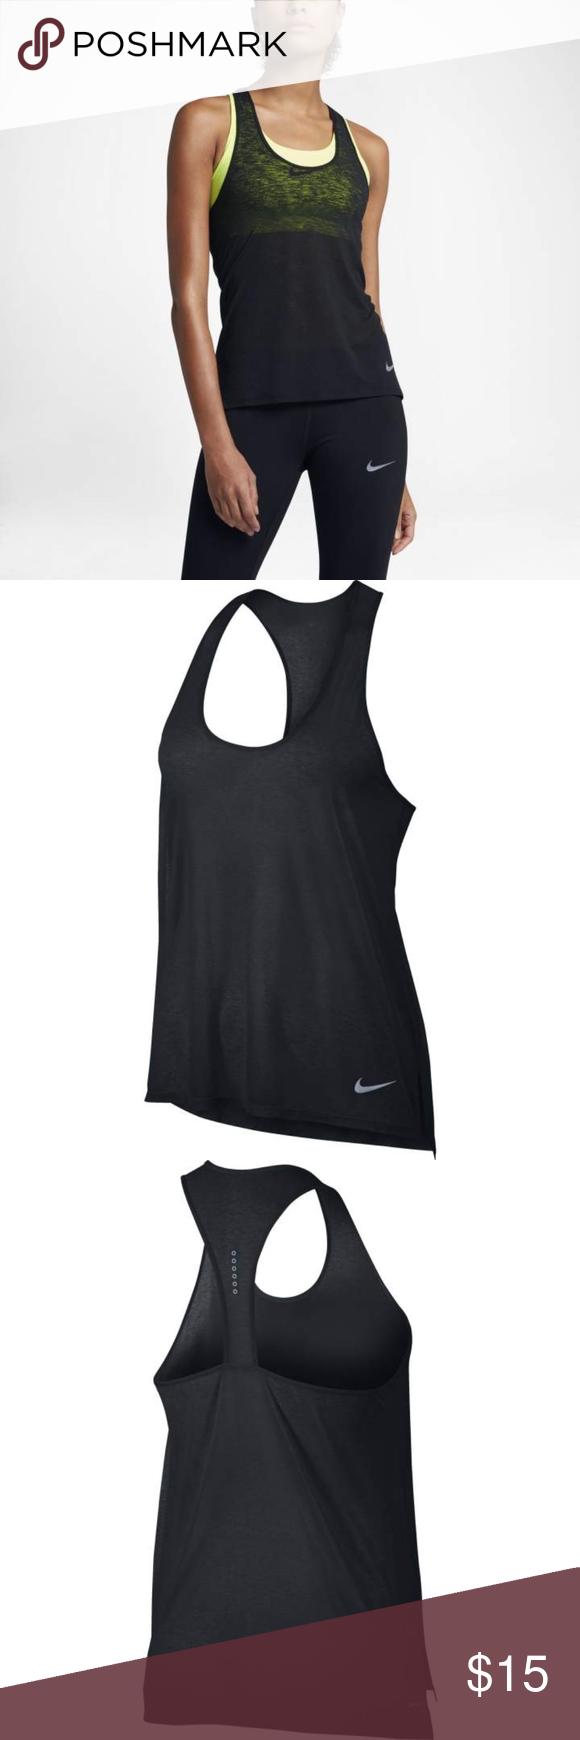 7338adbcab72c Nike Women s Breathe Cool Running Tank in Black ULTIMATE LIGHTWEIGHT  FREEDOM. The Women s Nike Breathe